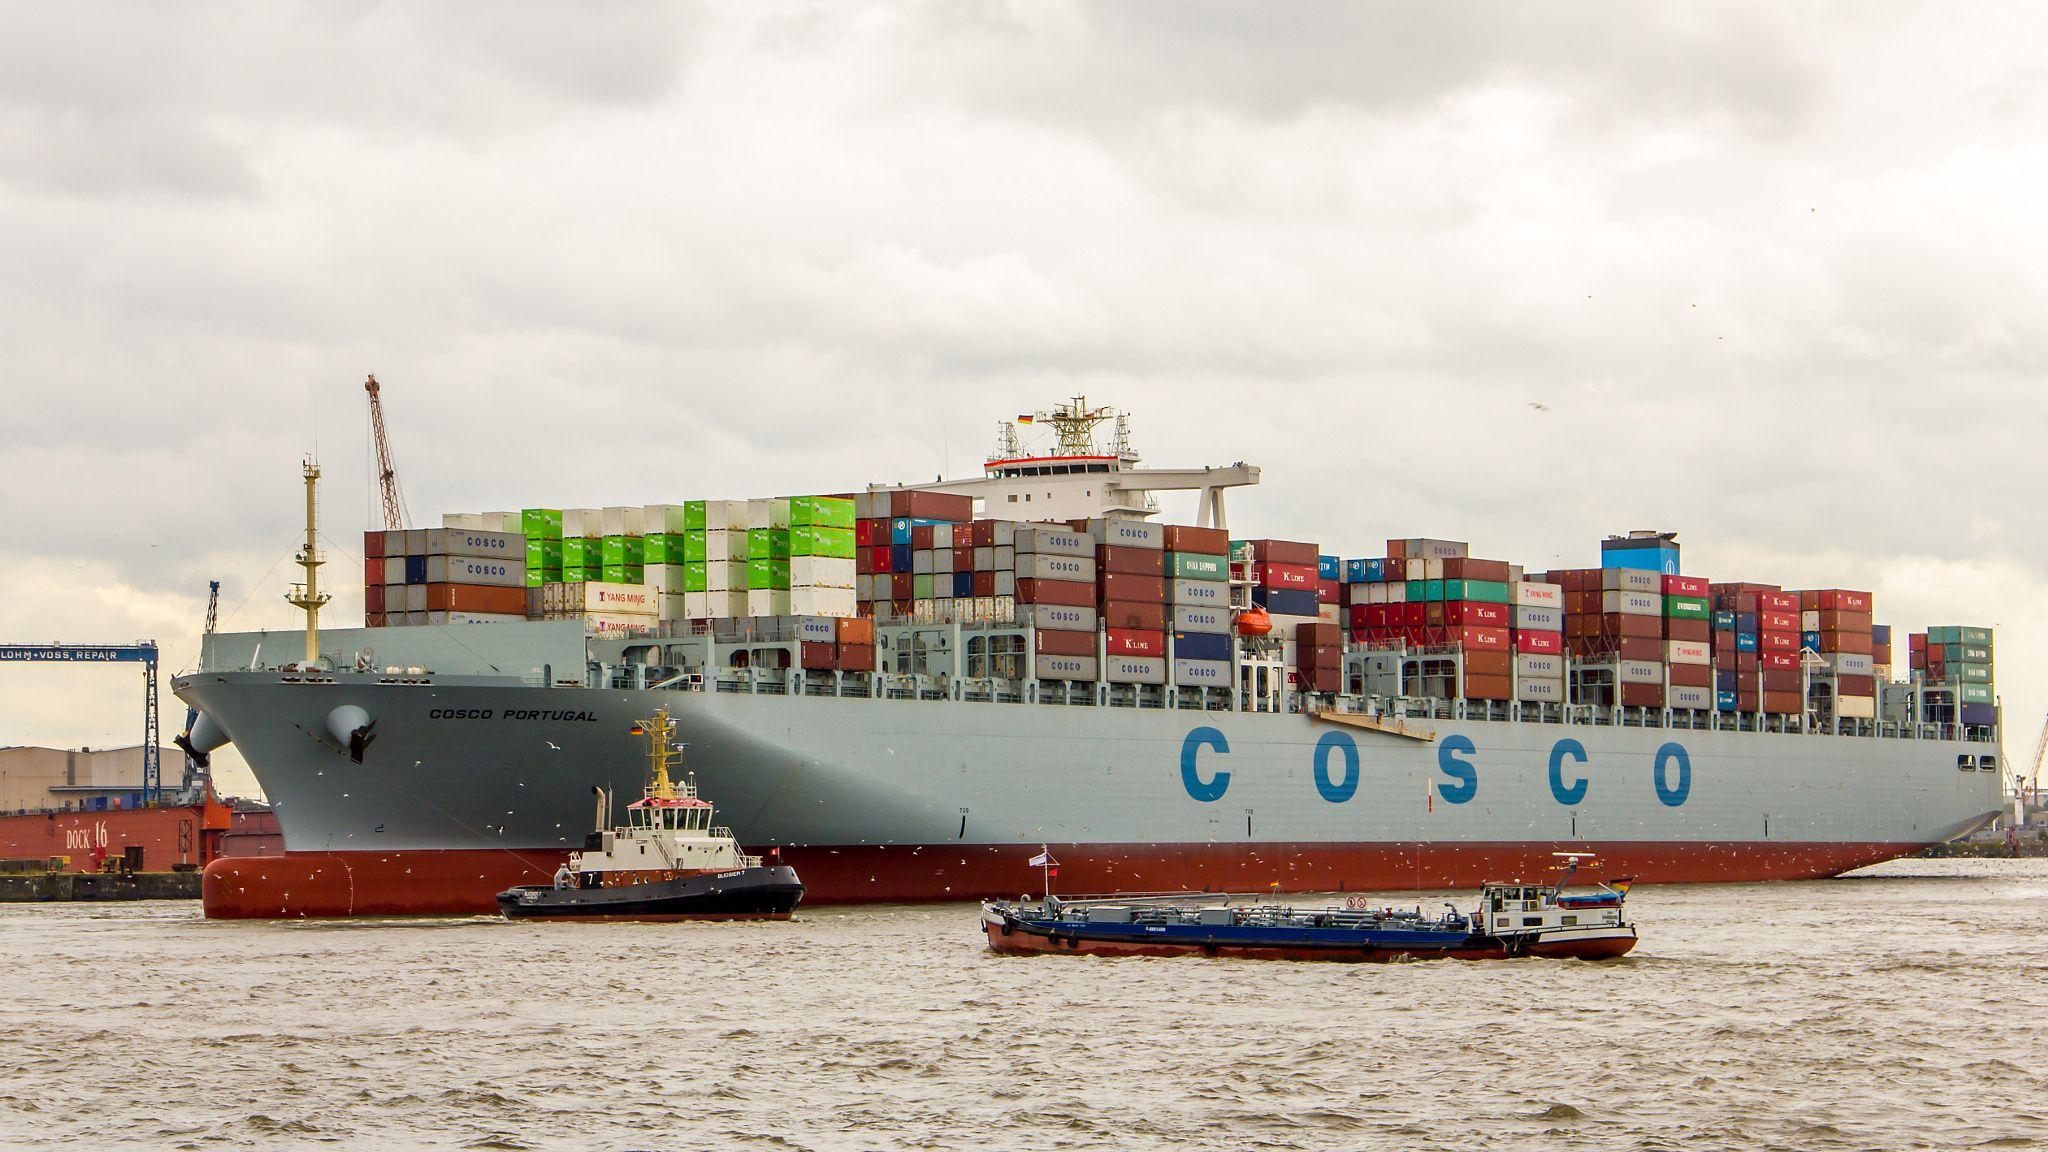 COSCO PORTUGAL in the Port of Hamburg by Michael Schloz on 500px. #Tollerort #hamburg #hamburgerhafen #portofhamburg #hafen #port #COSCO #COSCOPortugal #Schlepper #Elbe #Containerschiff #containership #container